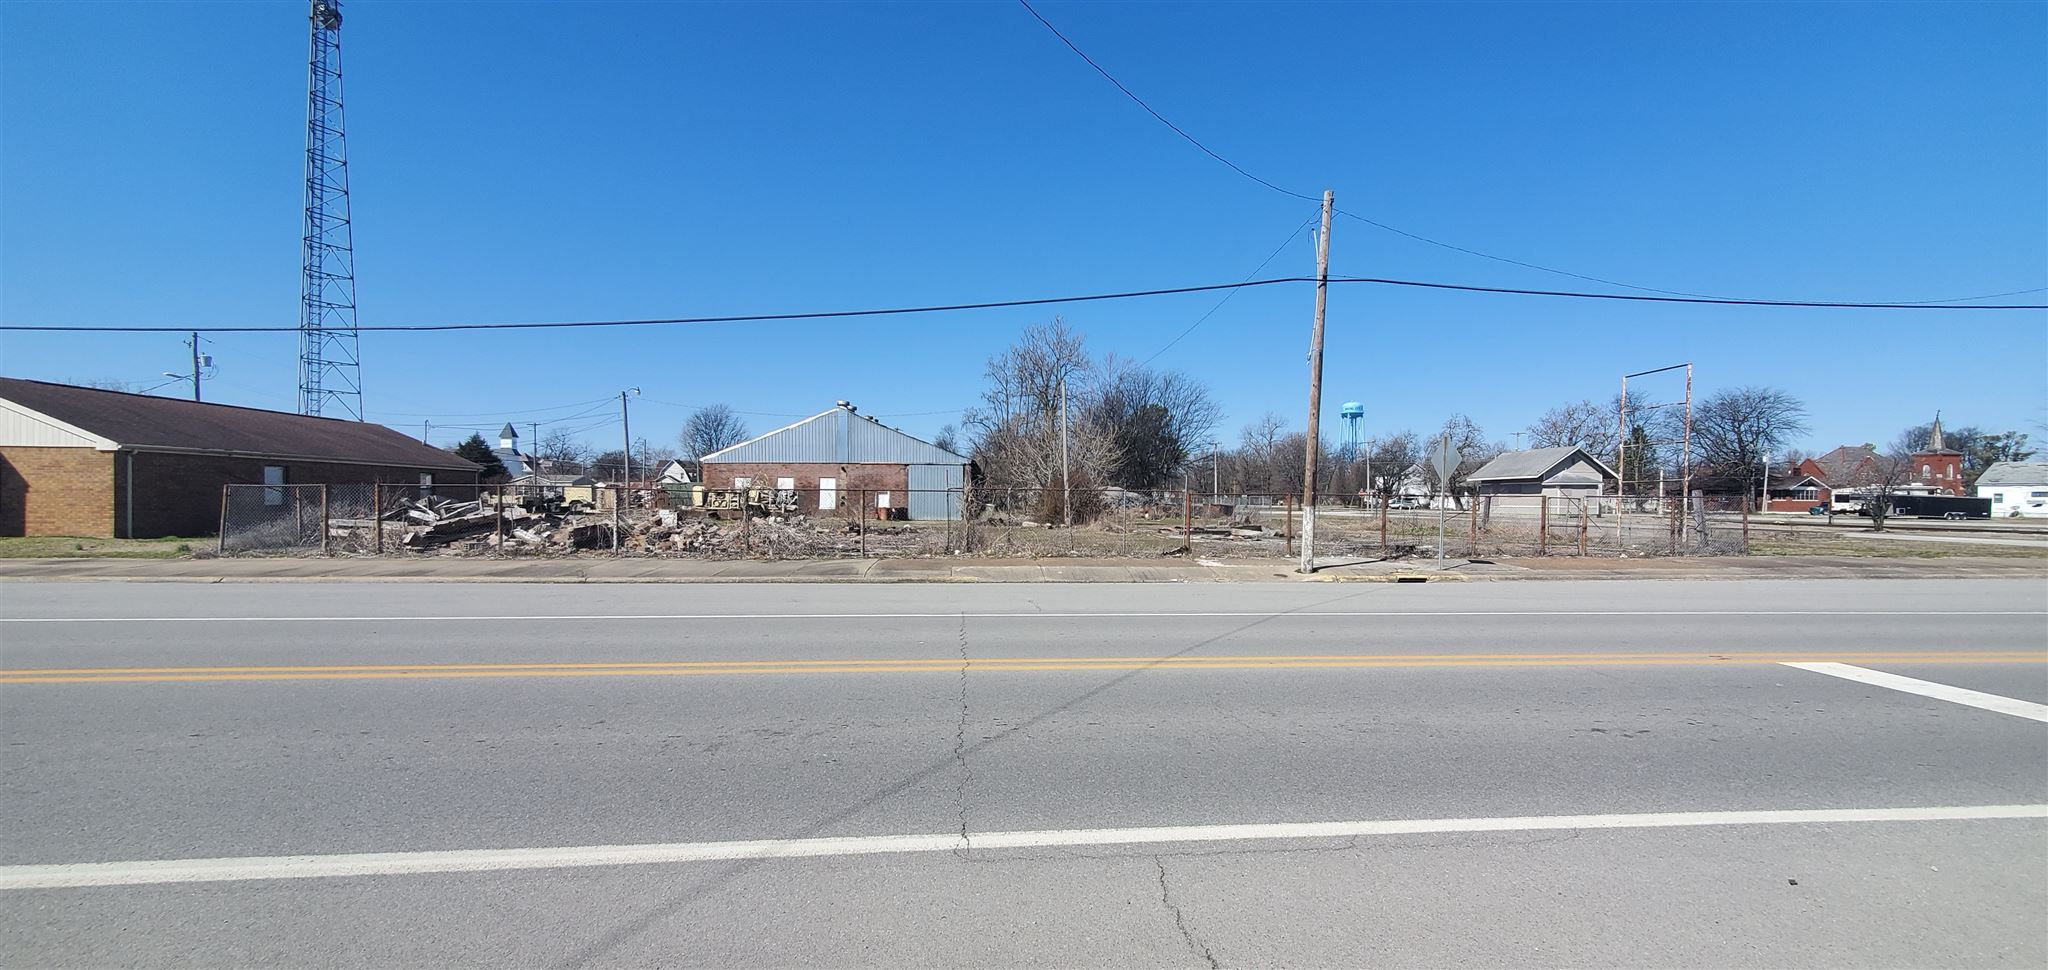 231 & 235 MAIN Property Photo - Mound City, IL real estate listing